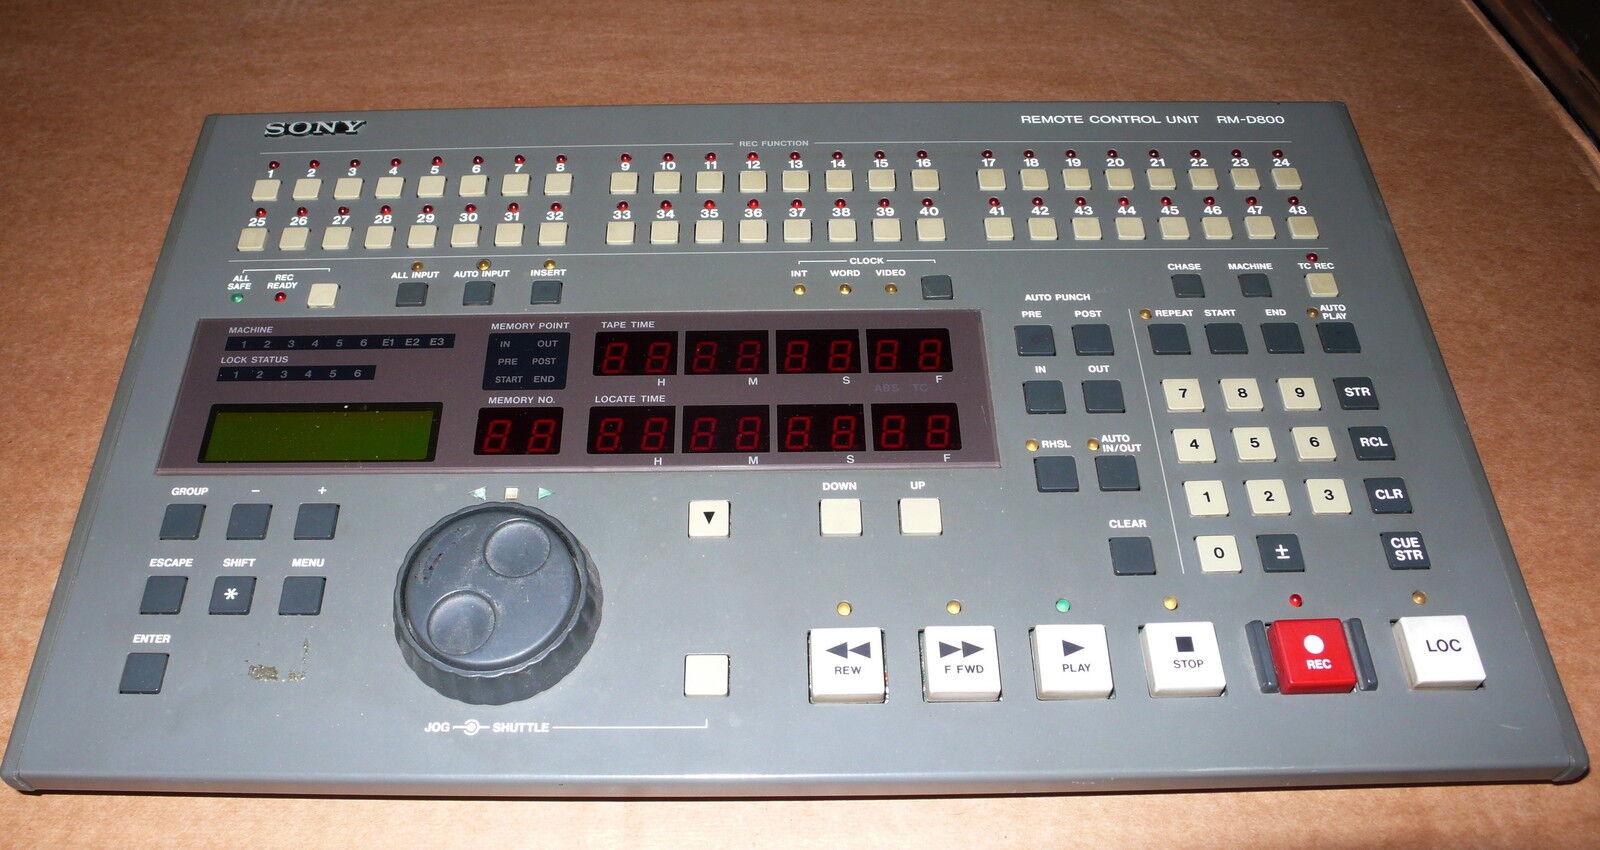 SONY RM-D800 REMOTE CONTROL UNIT FOR PCM 800